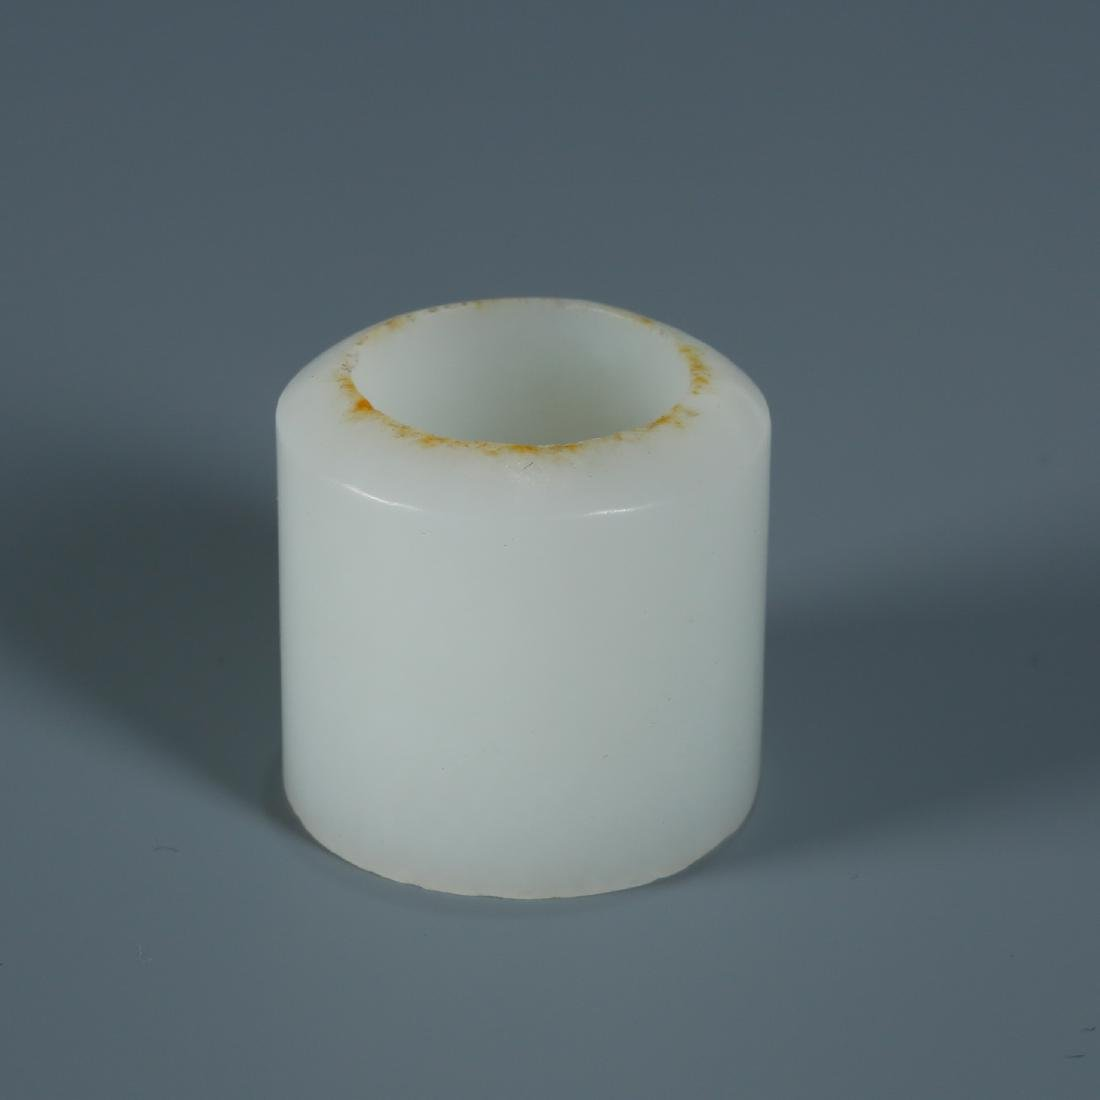 White Jade Archers Ring - 6